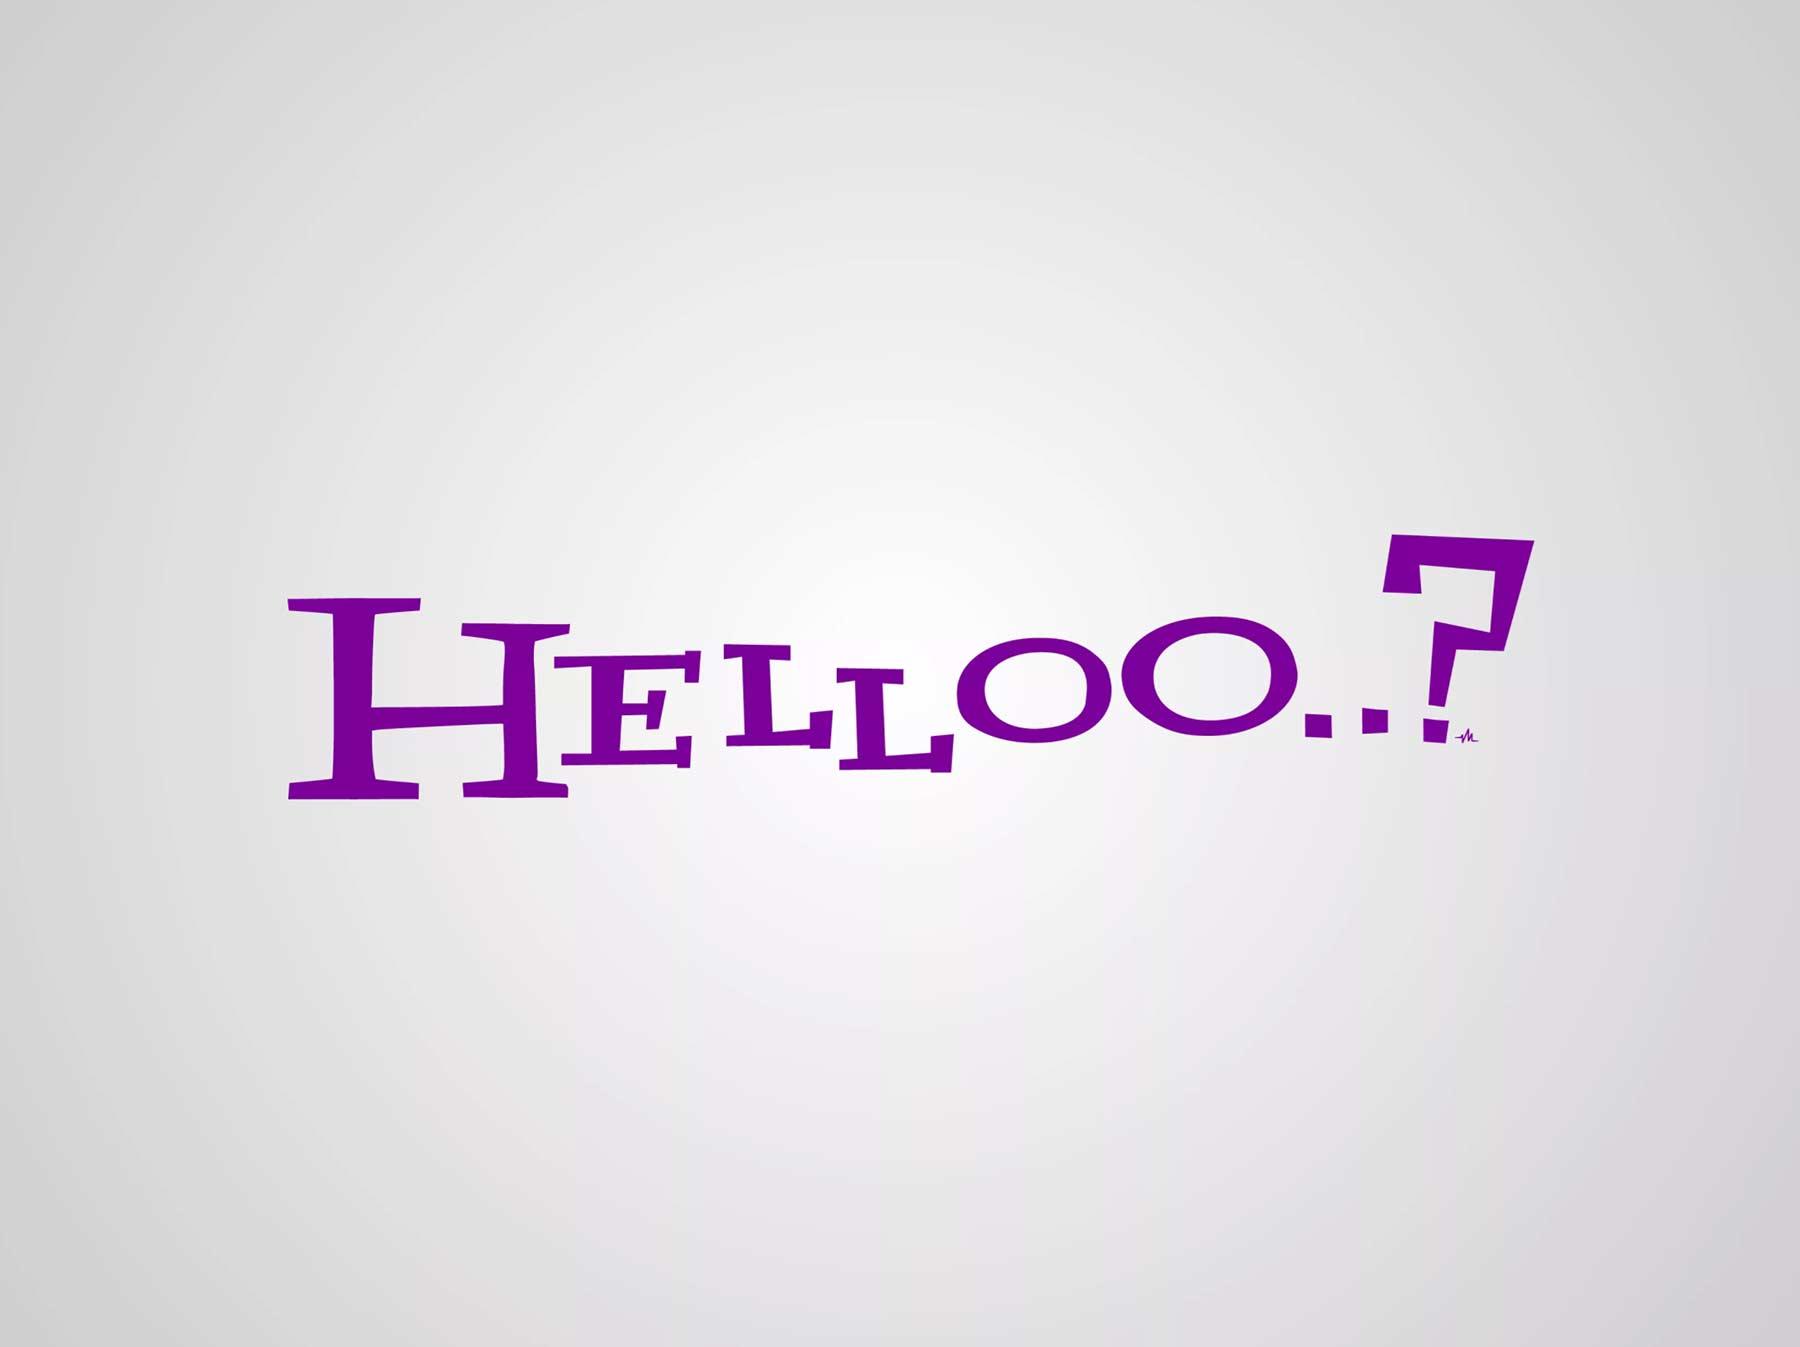 Neue ehrliche Markenlogos von Viktor Hertz Honest-Logos-3-Viktor-Hertz_02